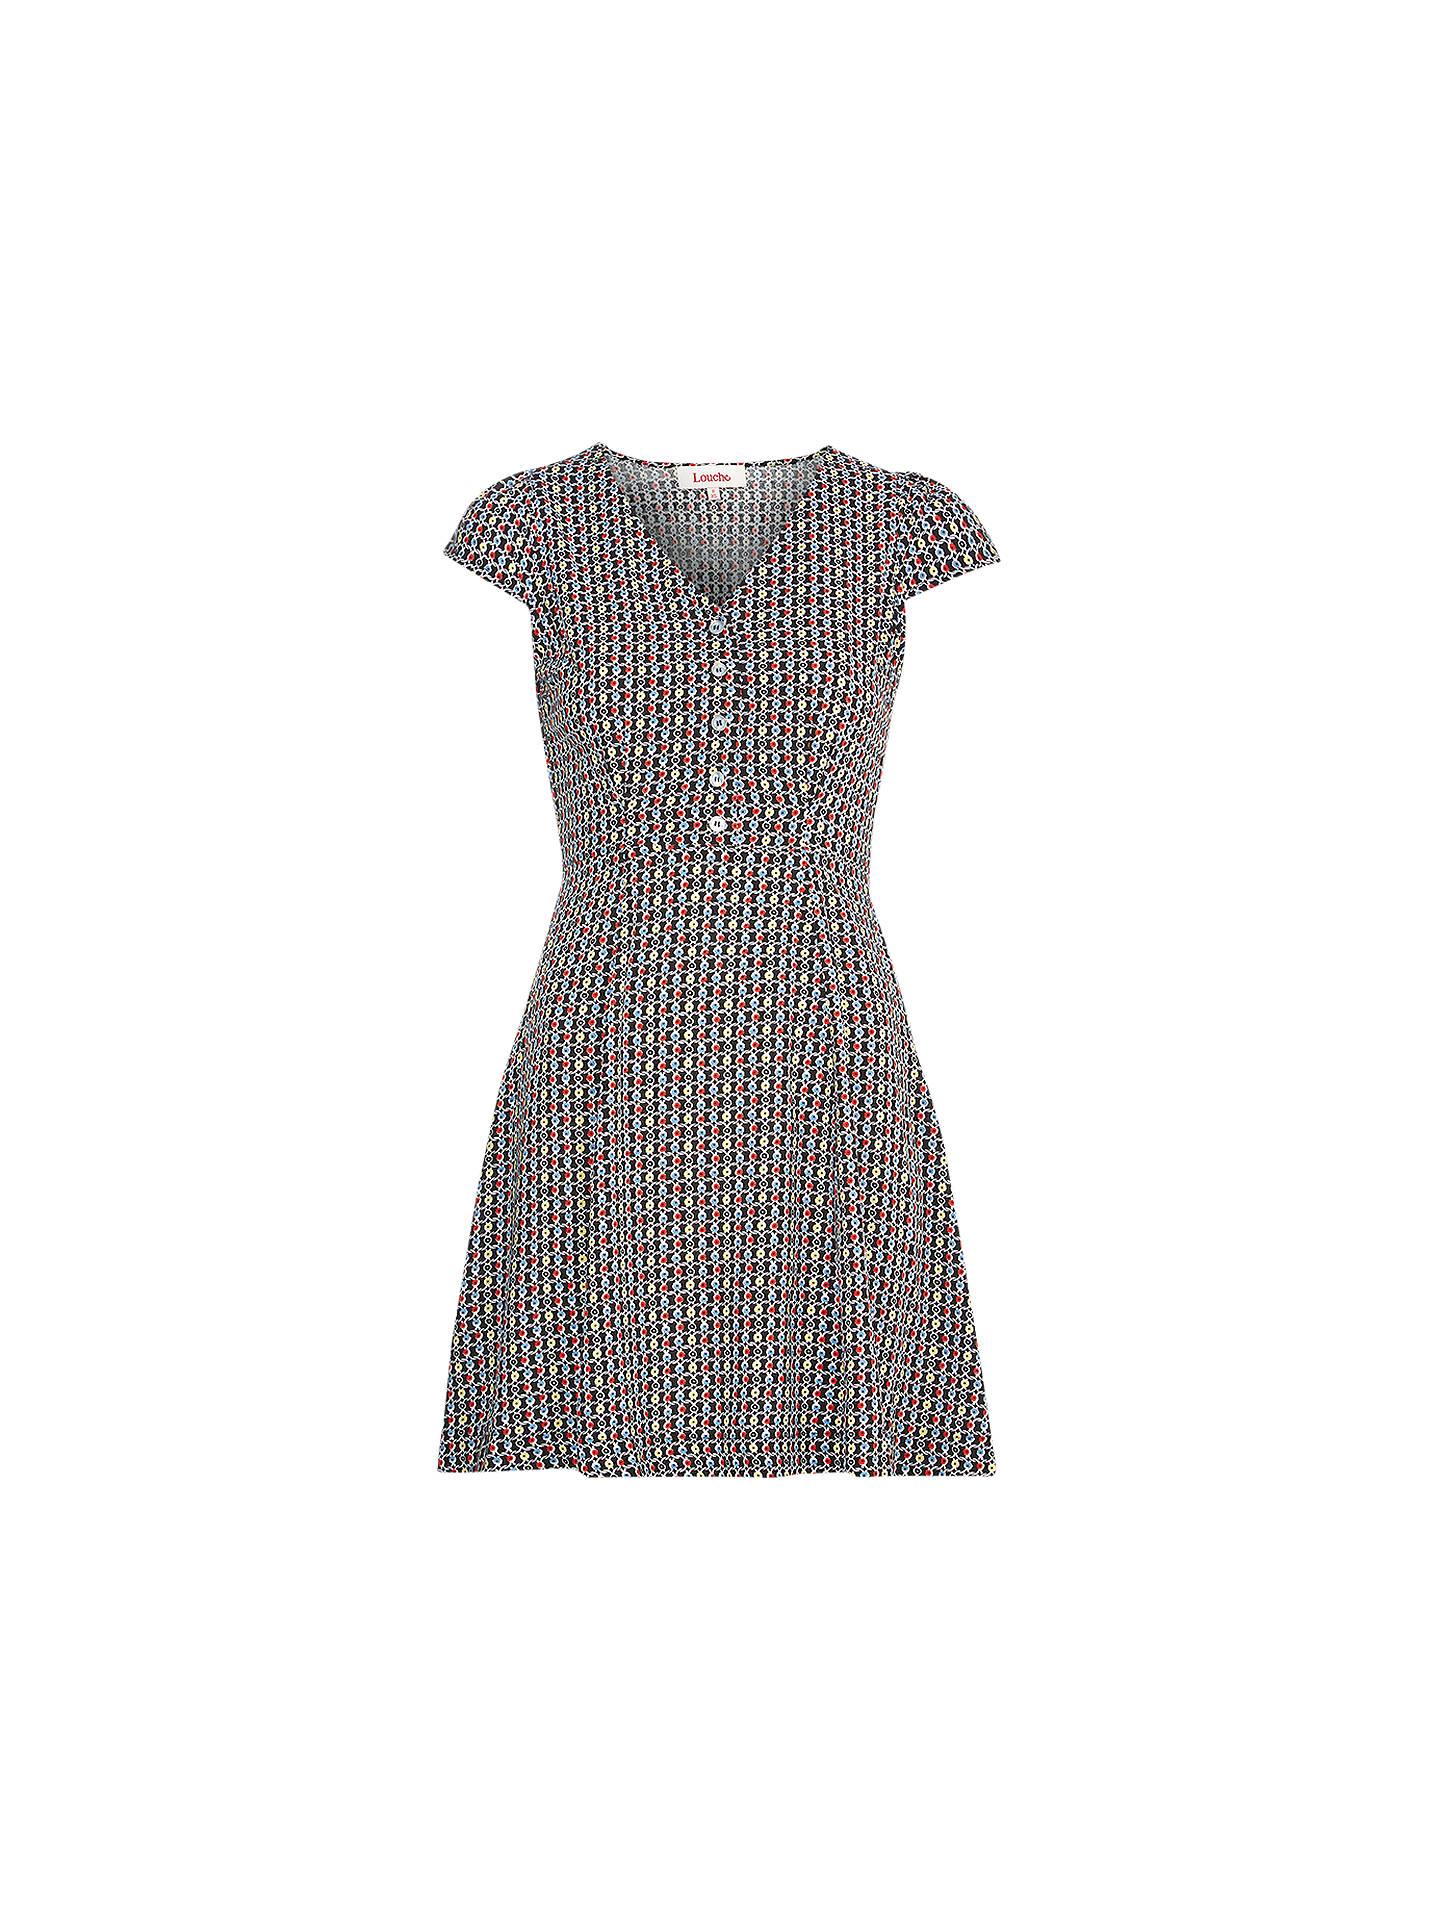 153c4586c04b Buy Louche Cathleen Twine Print Dress, Multi, 8 Online at johnlewis.com ...